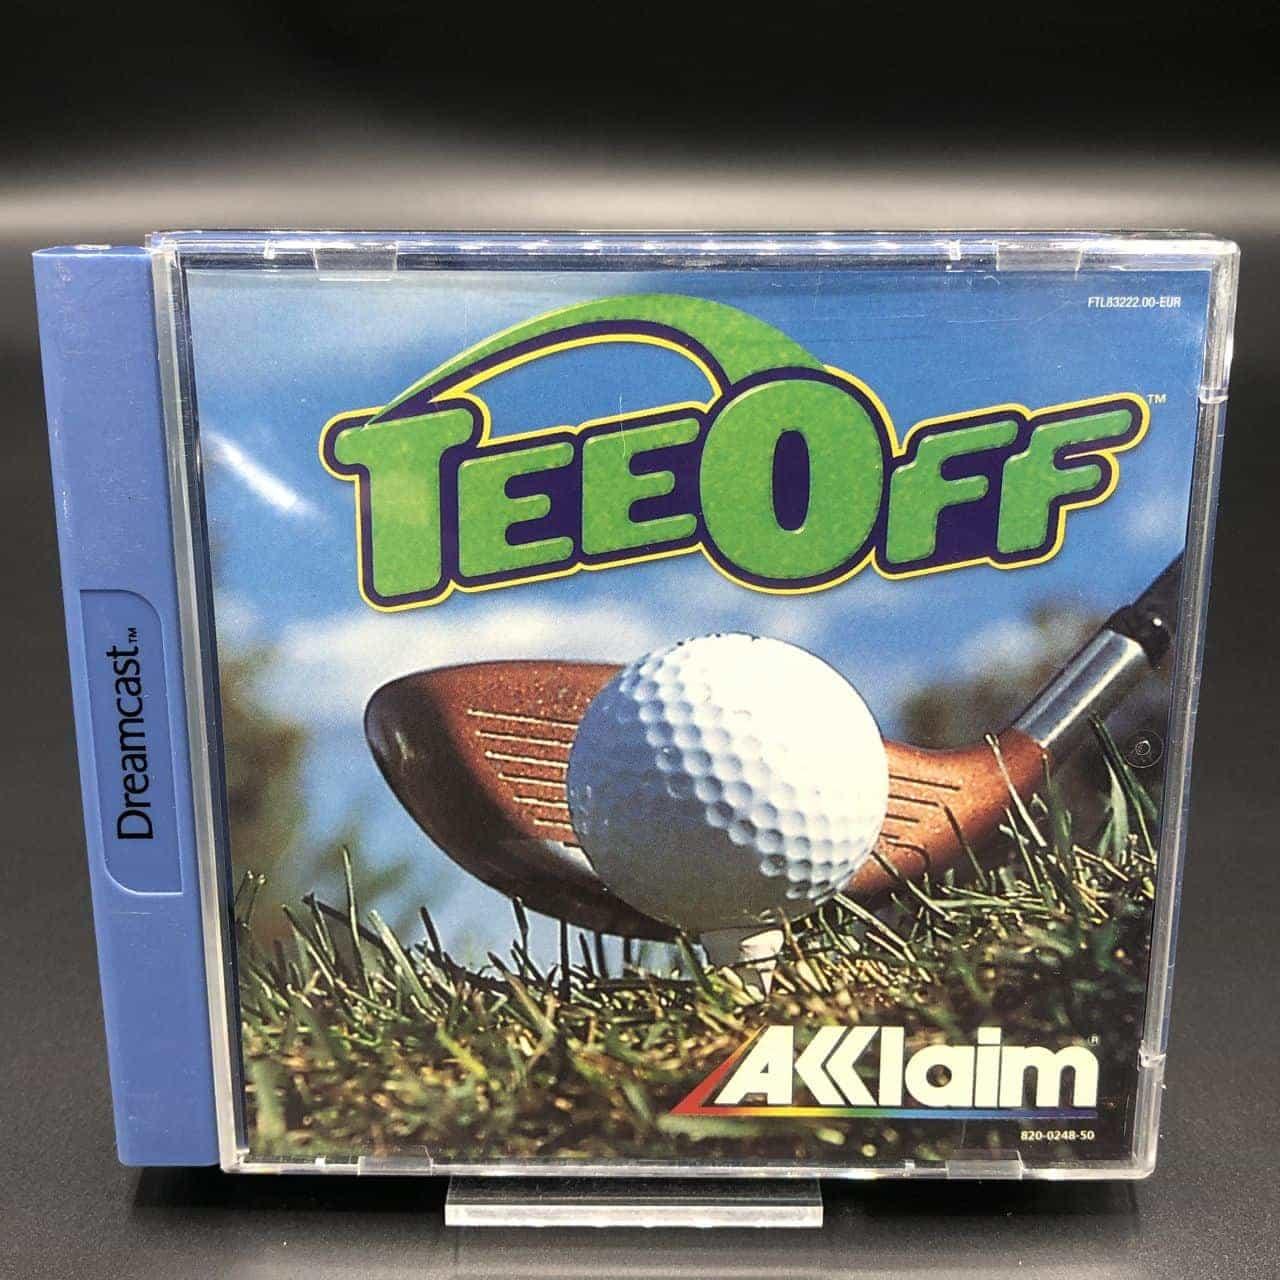 Tee Off (Komplett) (Sehr gut) Sega Dreamcast #2